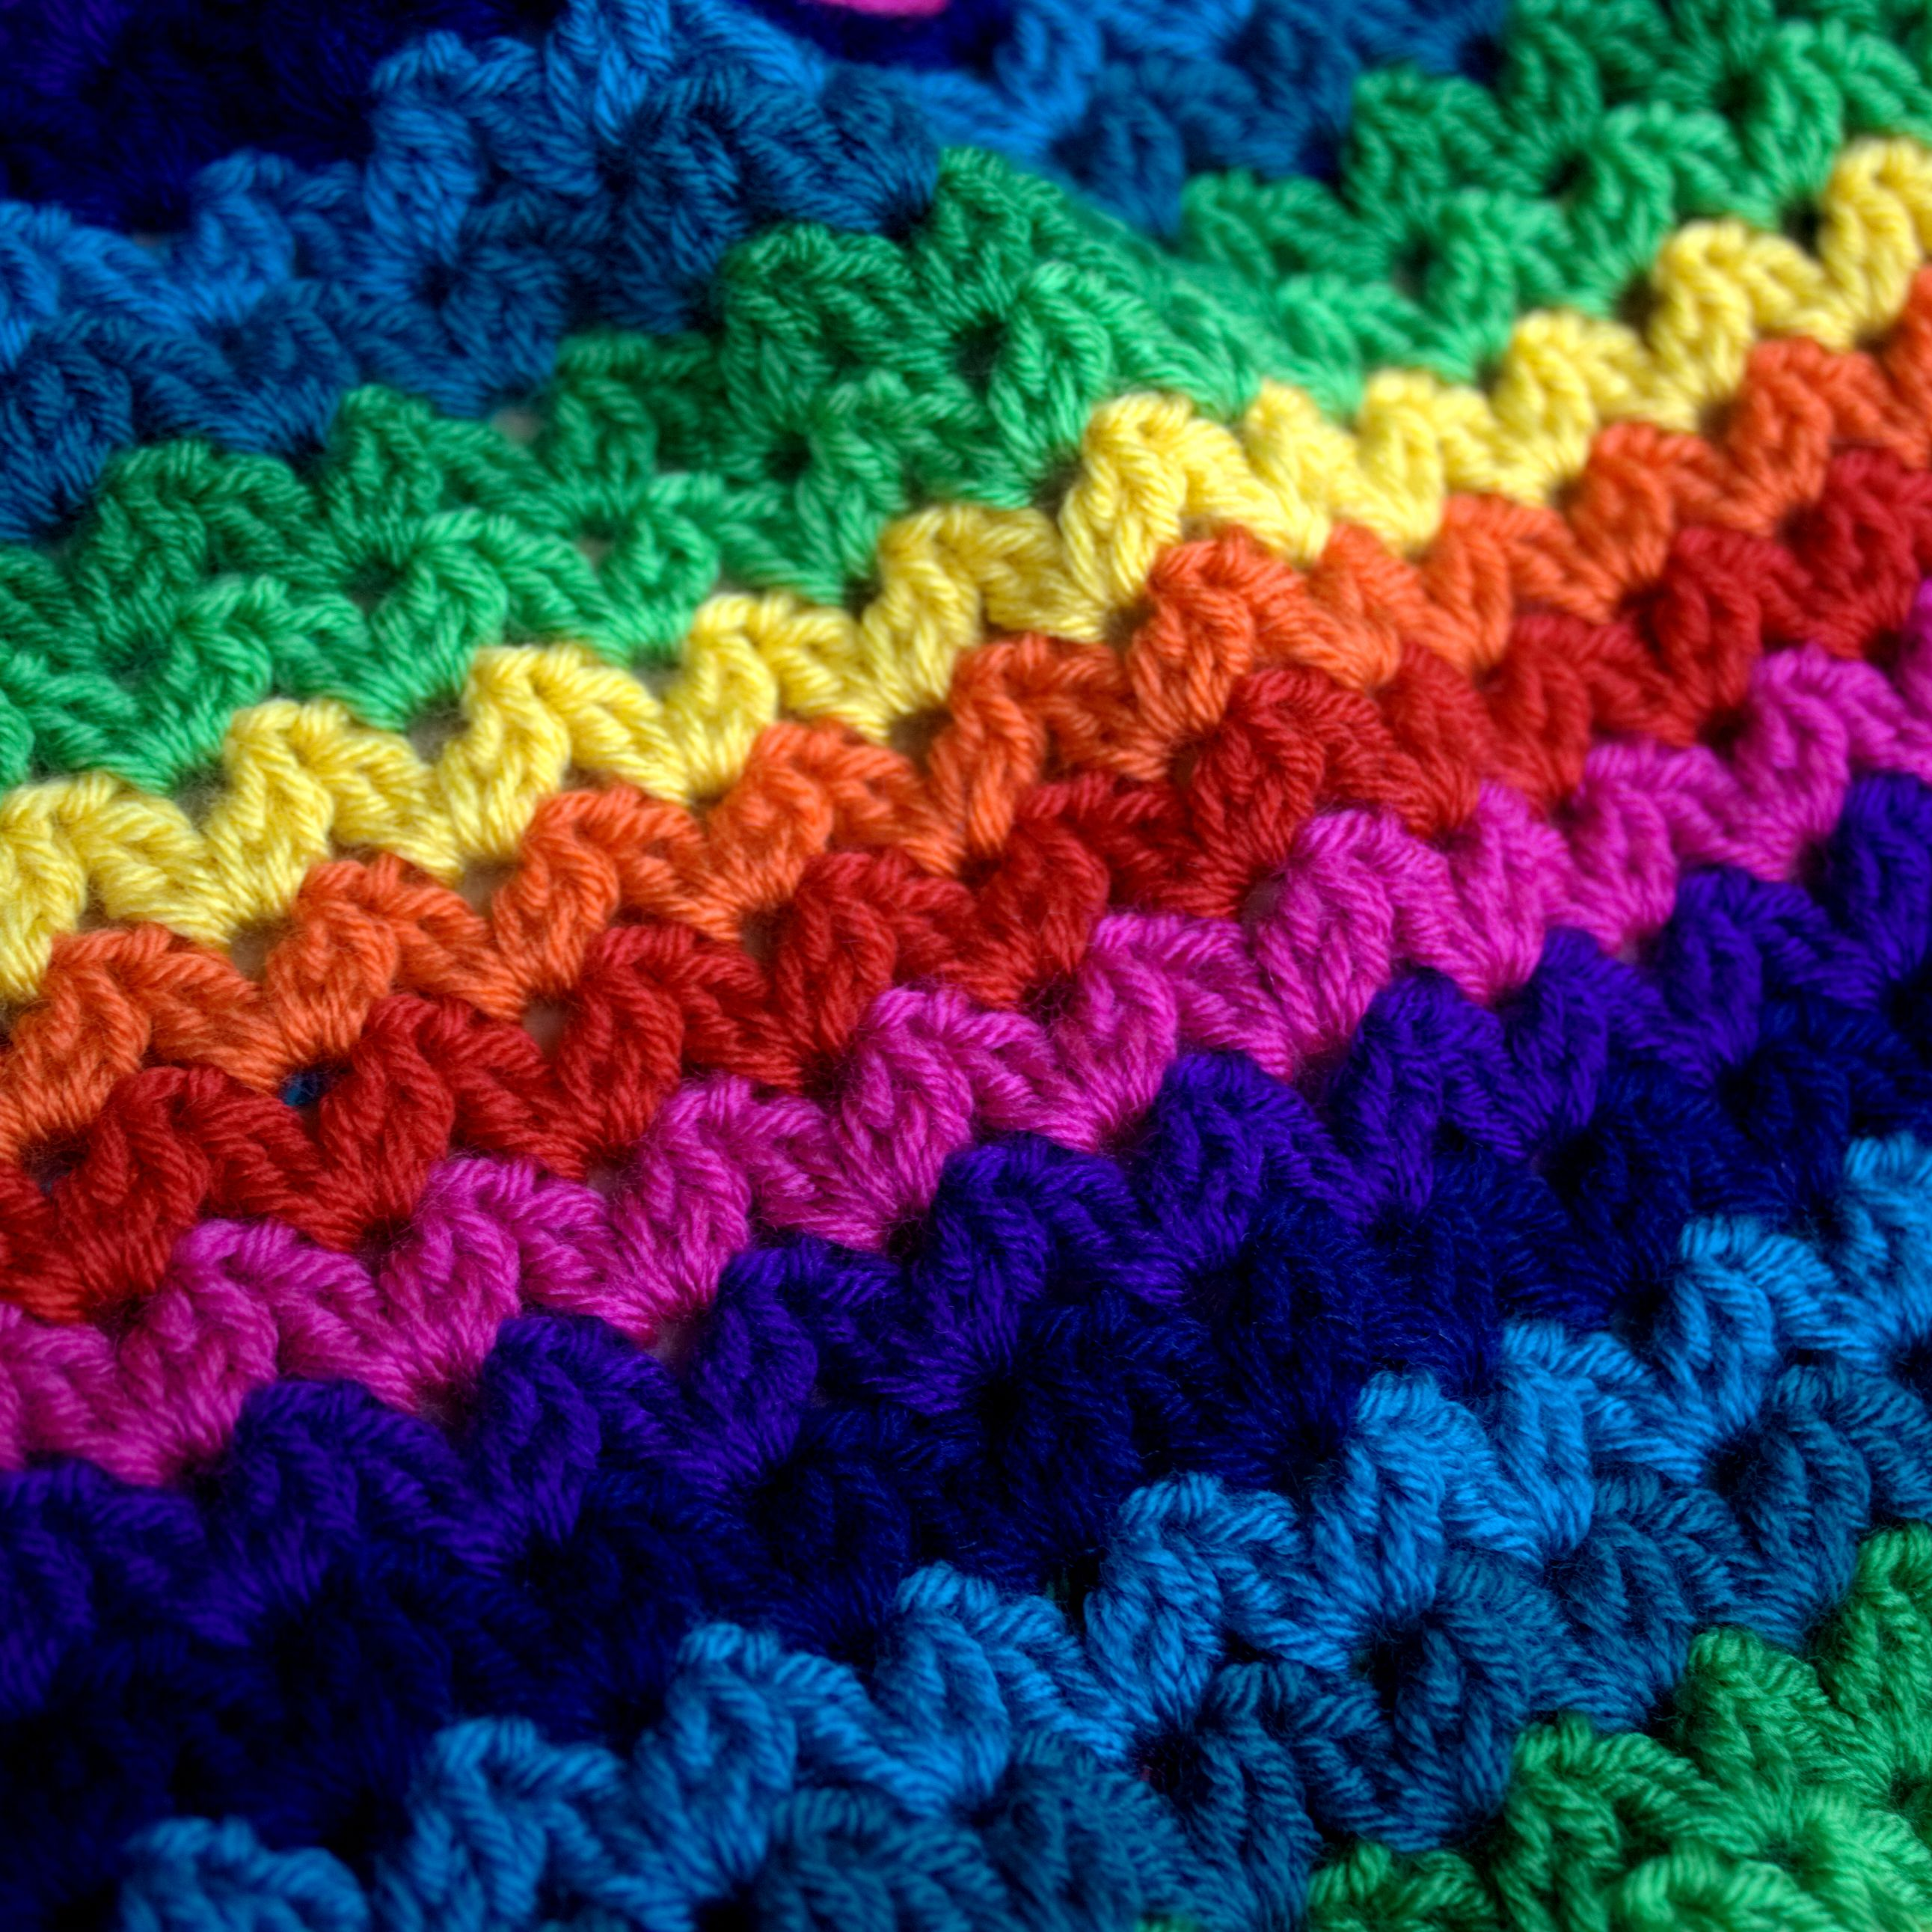 Ric rac blanket a beginners crochet blanket in rainbow colourway